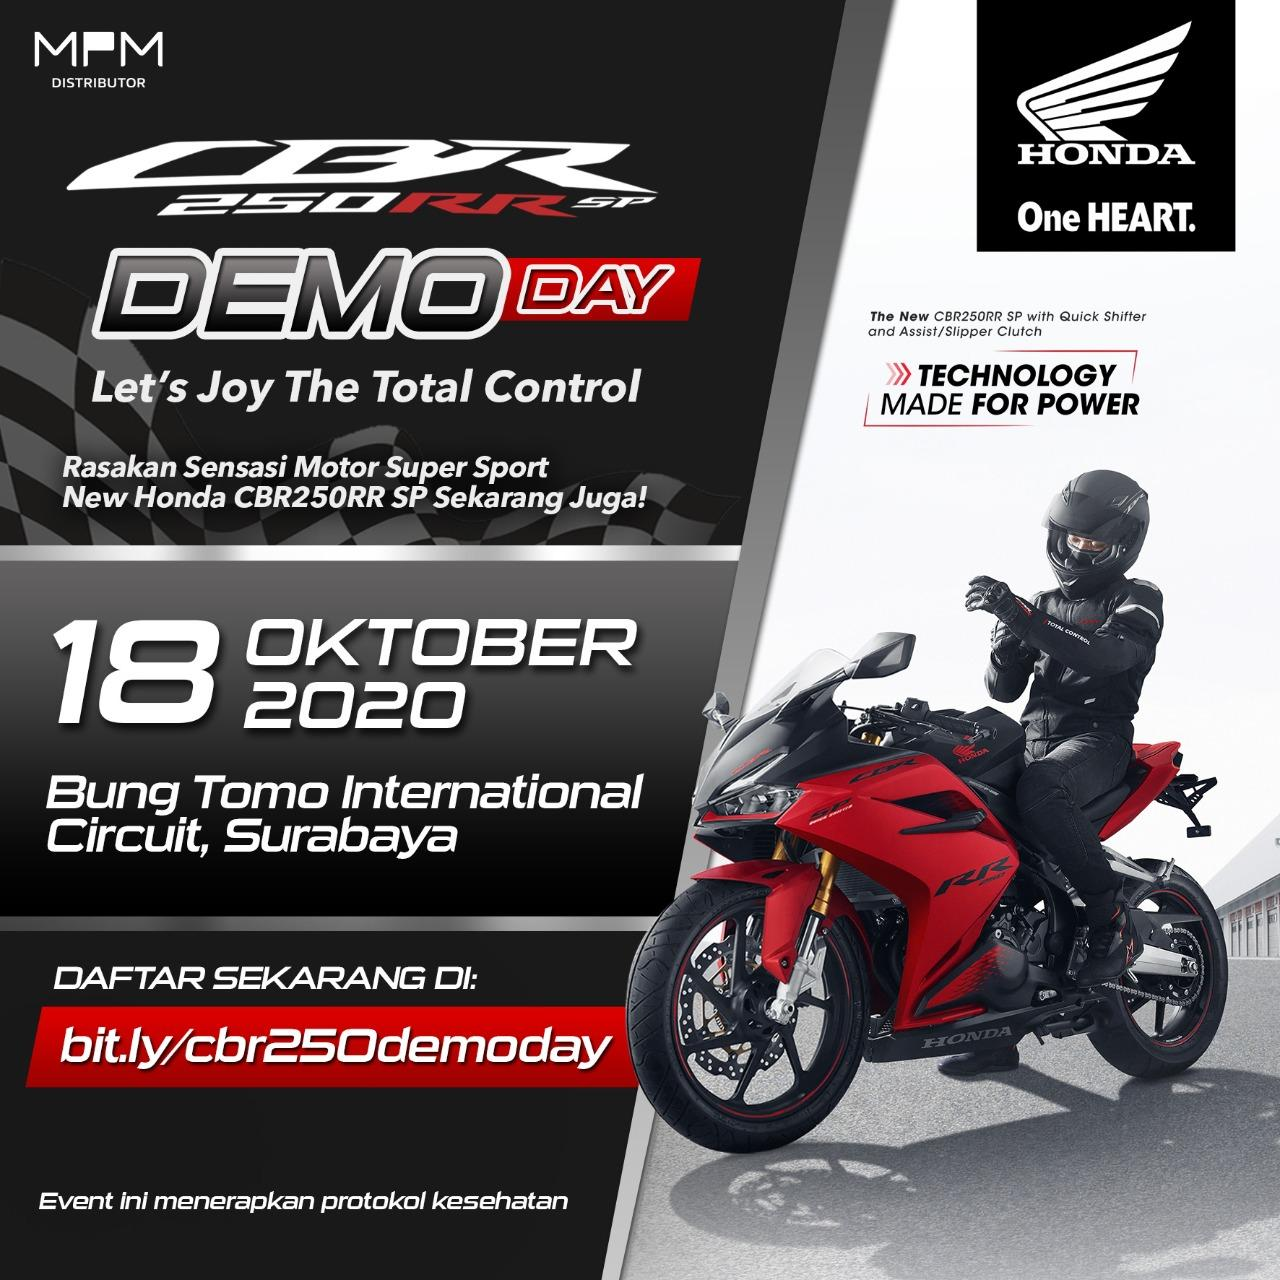 Rasakan Sensasi Berkendara New Honda CBR250RR SP Quick Shifter Di Sirkuit Pada CBR250RR SP Demoday